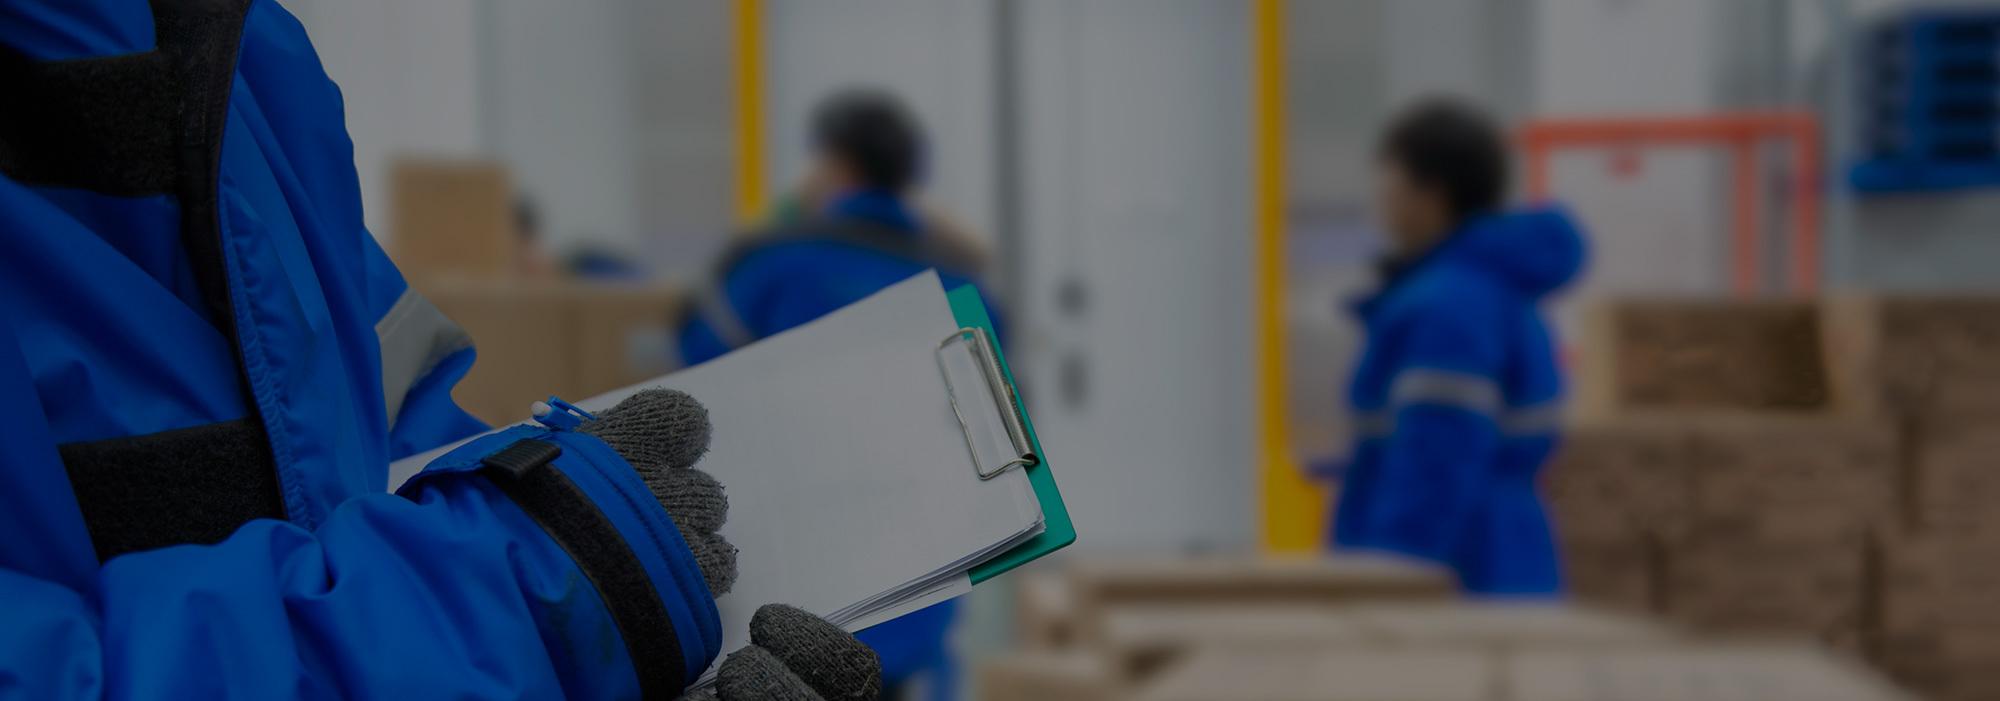 TAS refrigerated distribution transportation and storage of